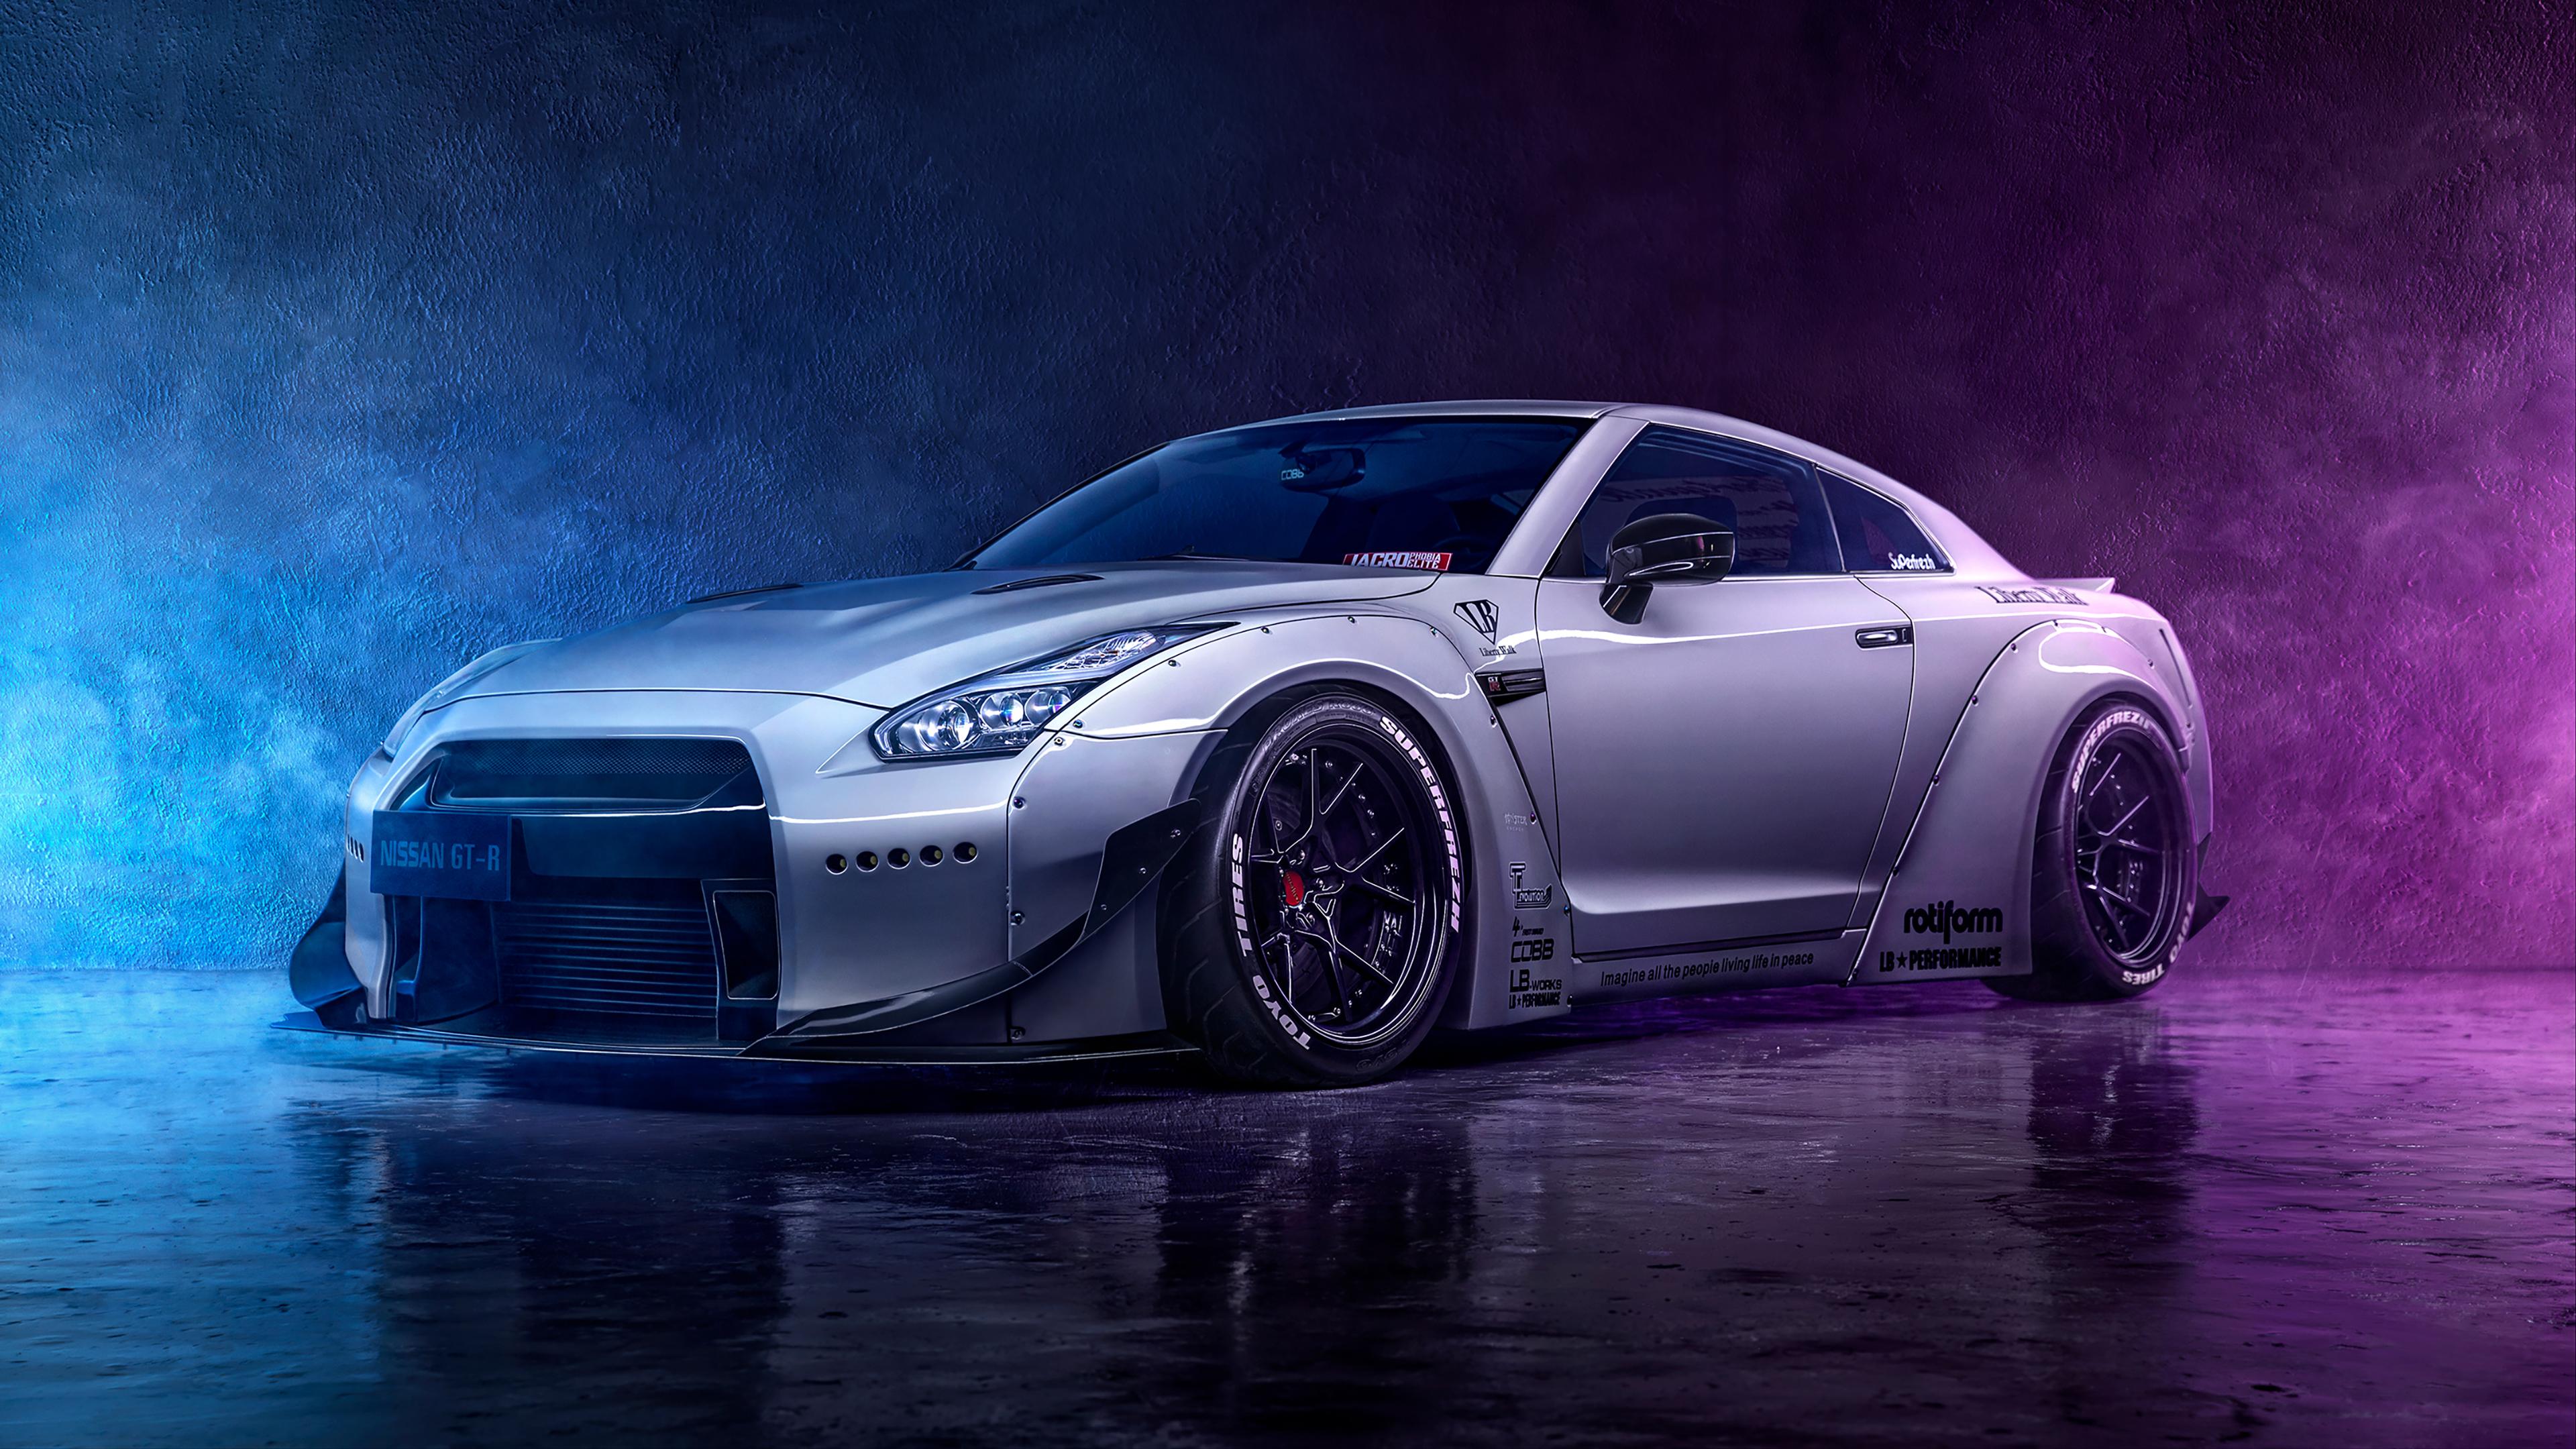 Nissan GT-R 4K Wallpaper | HD Car Wallpapers | ID #14950